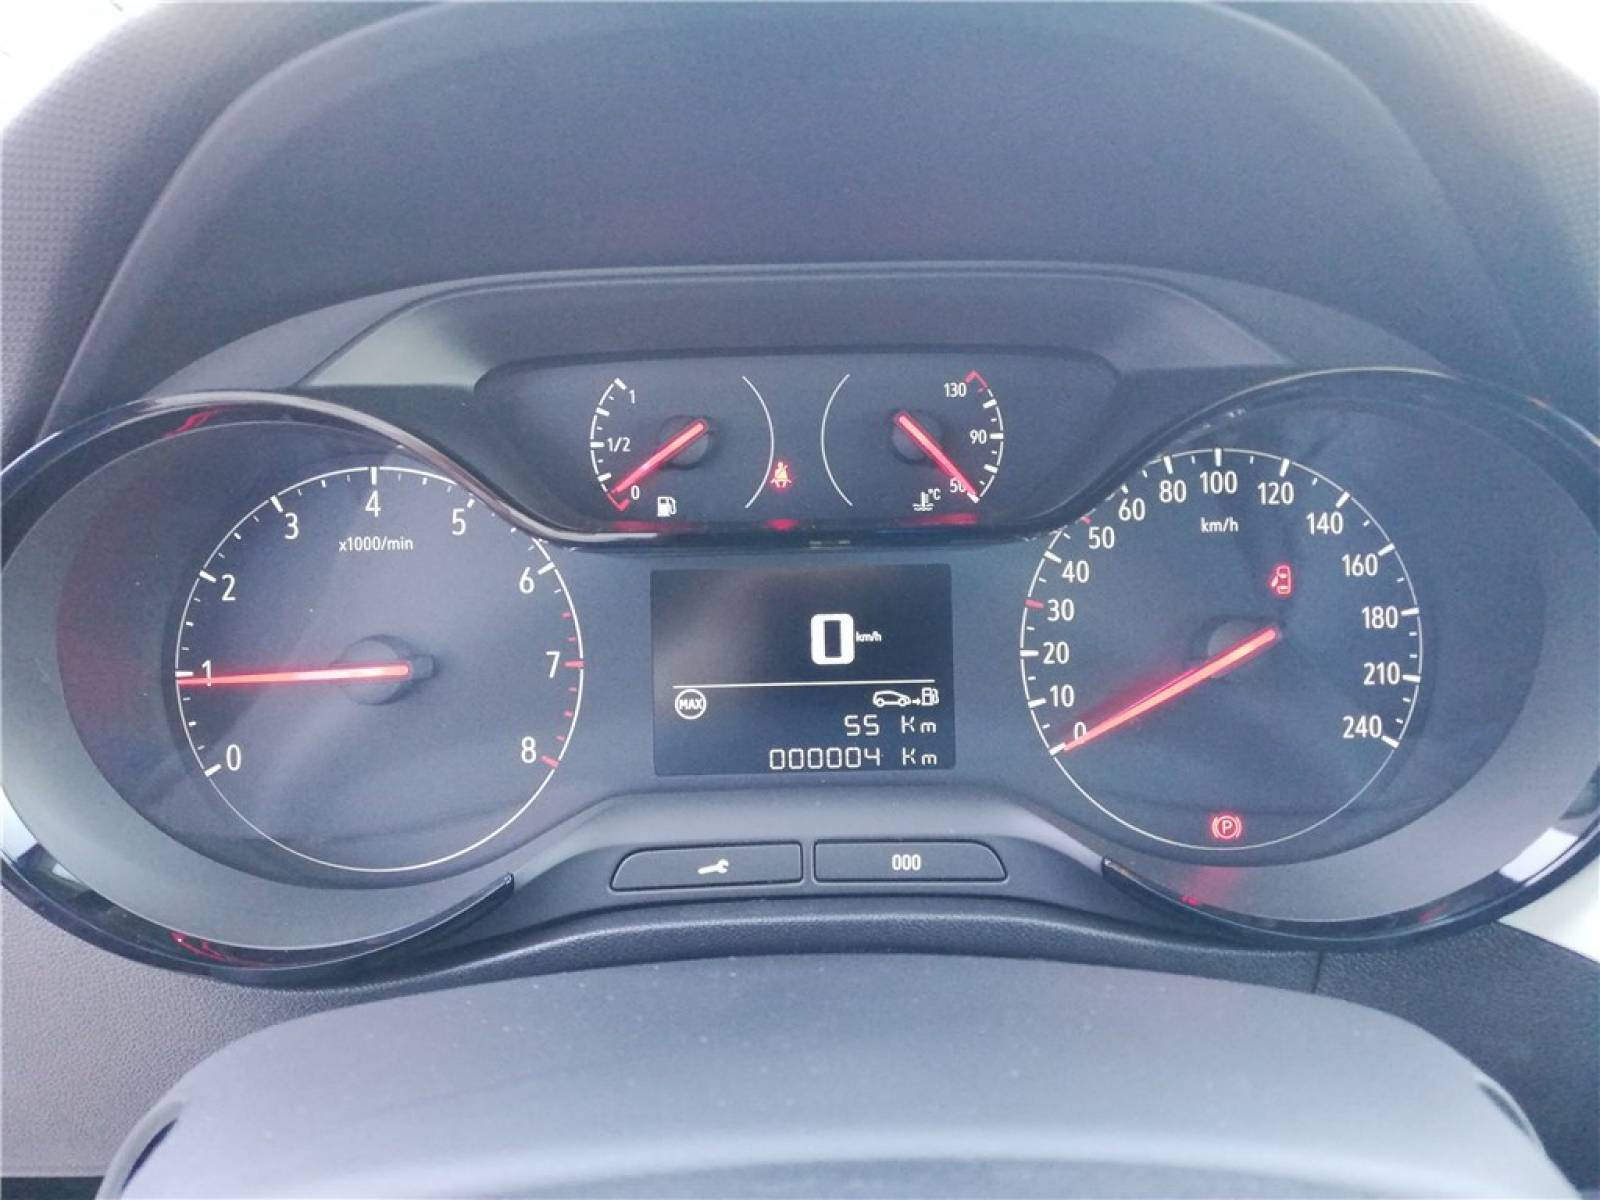 OPEL Crossland X 1.2 Turbo 110 ch - véhicule d'occasion - Groupe Guillet - Opel Magicauto - Chalon-sur-Saône - 71380 - Saint-Marcel - 35